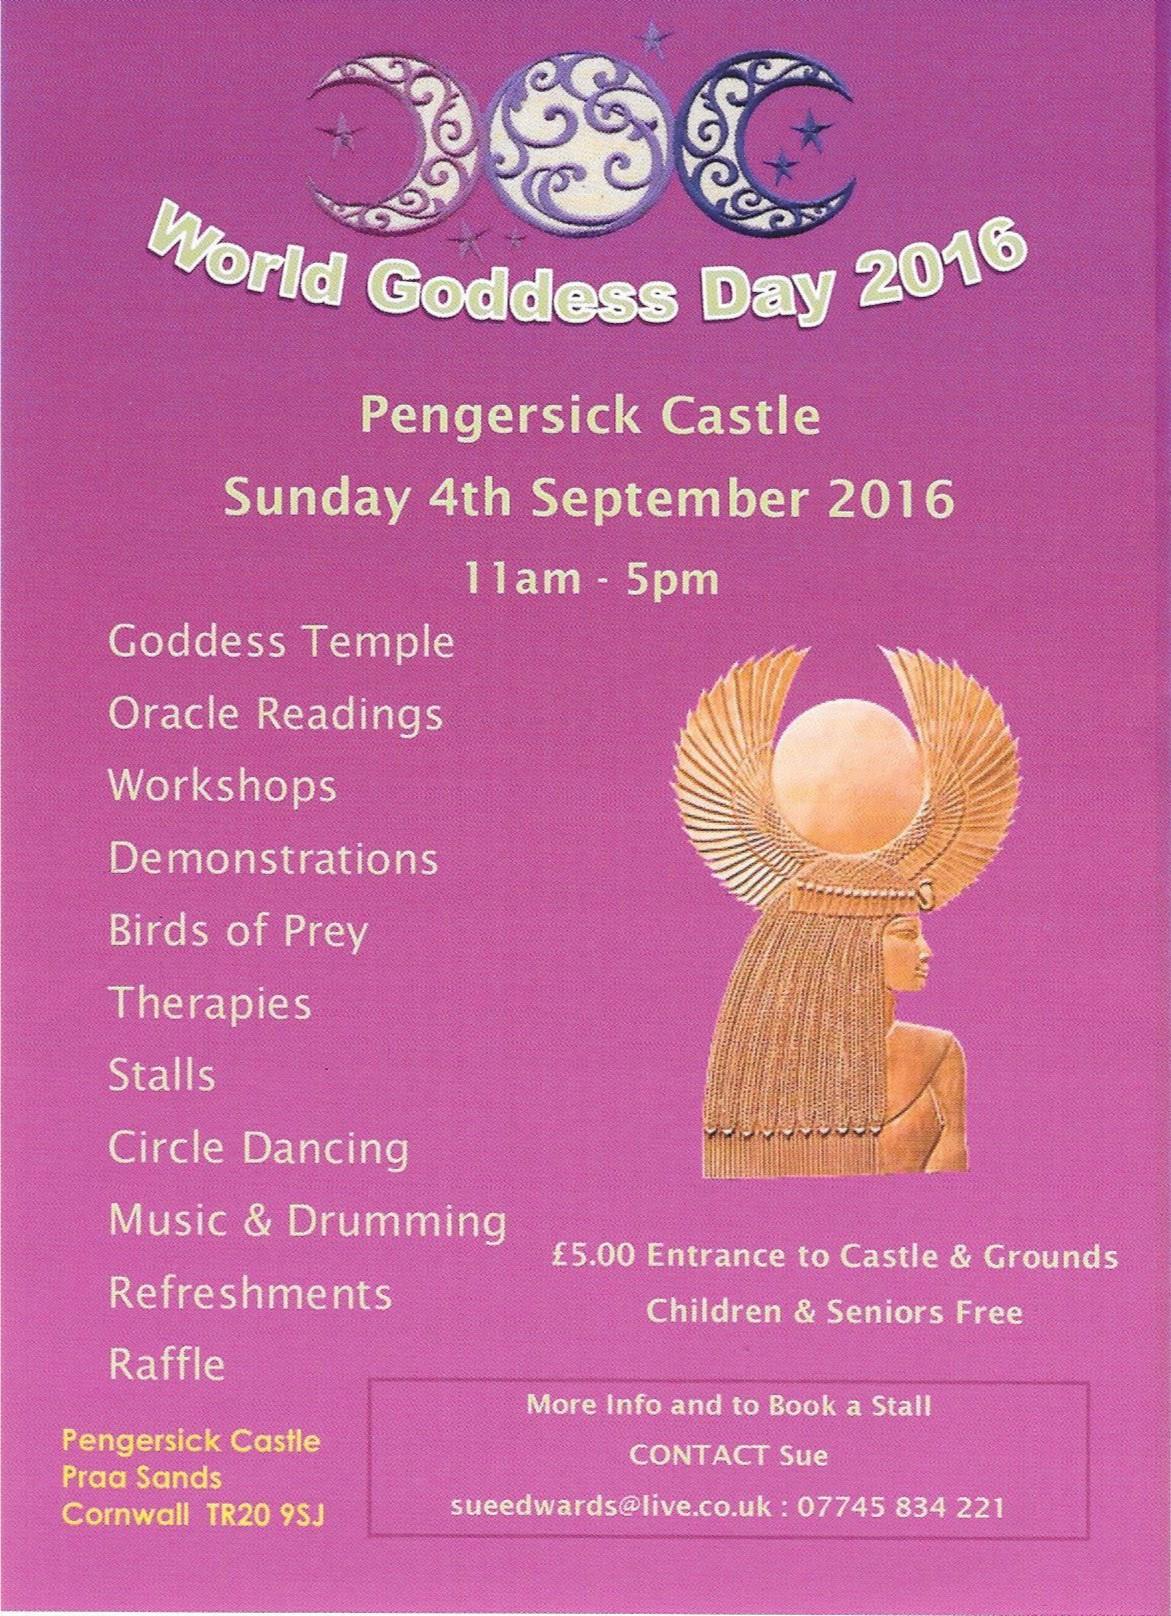 World Goddess Day in Cornwall